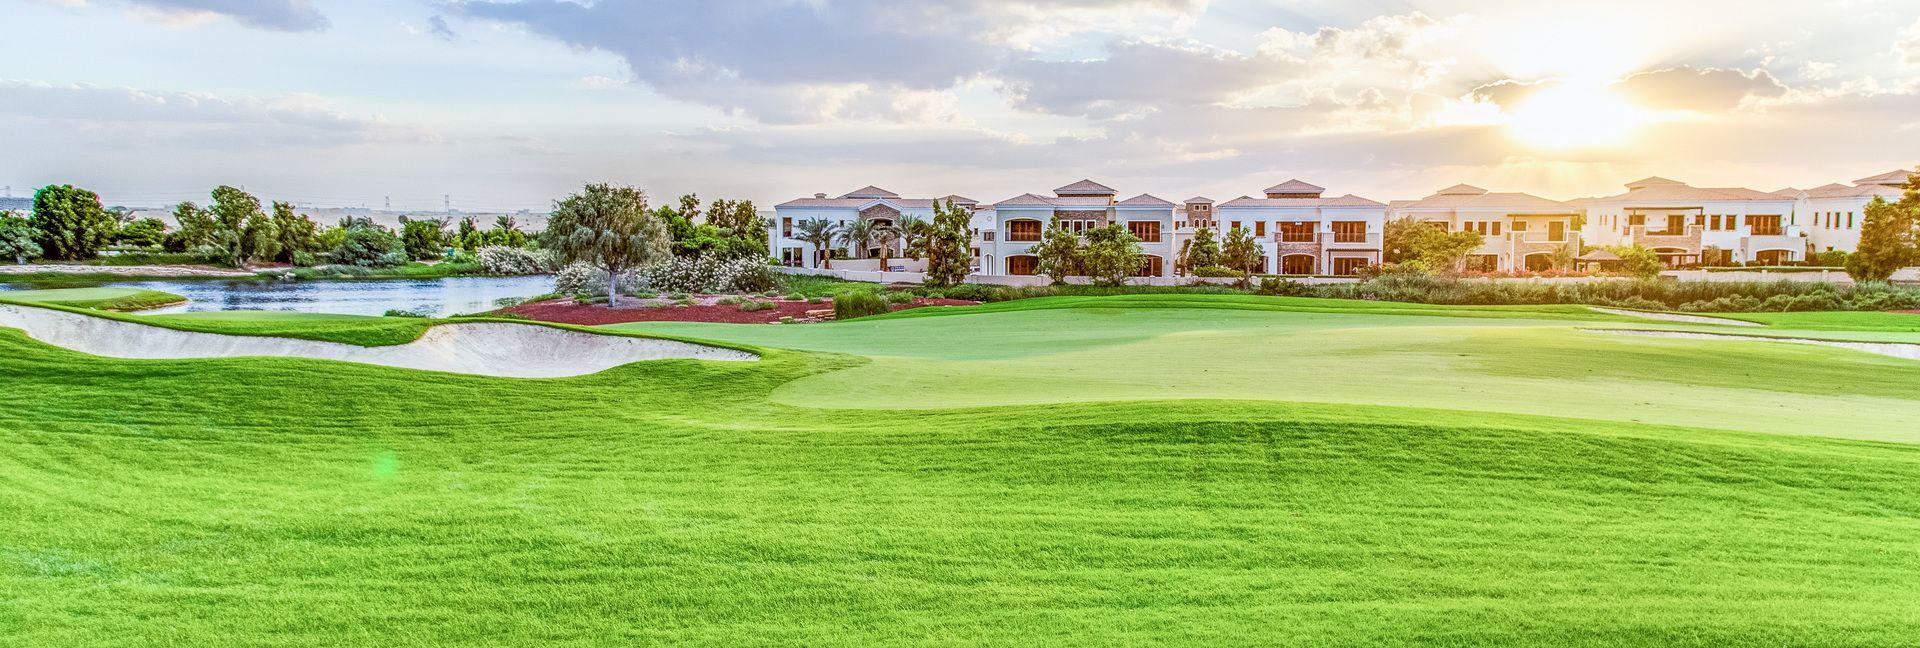 luxury-property-golf-estates-banner.jpg